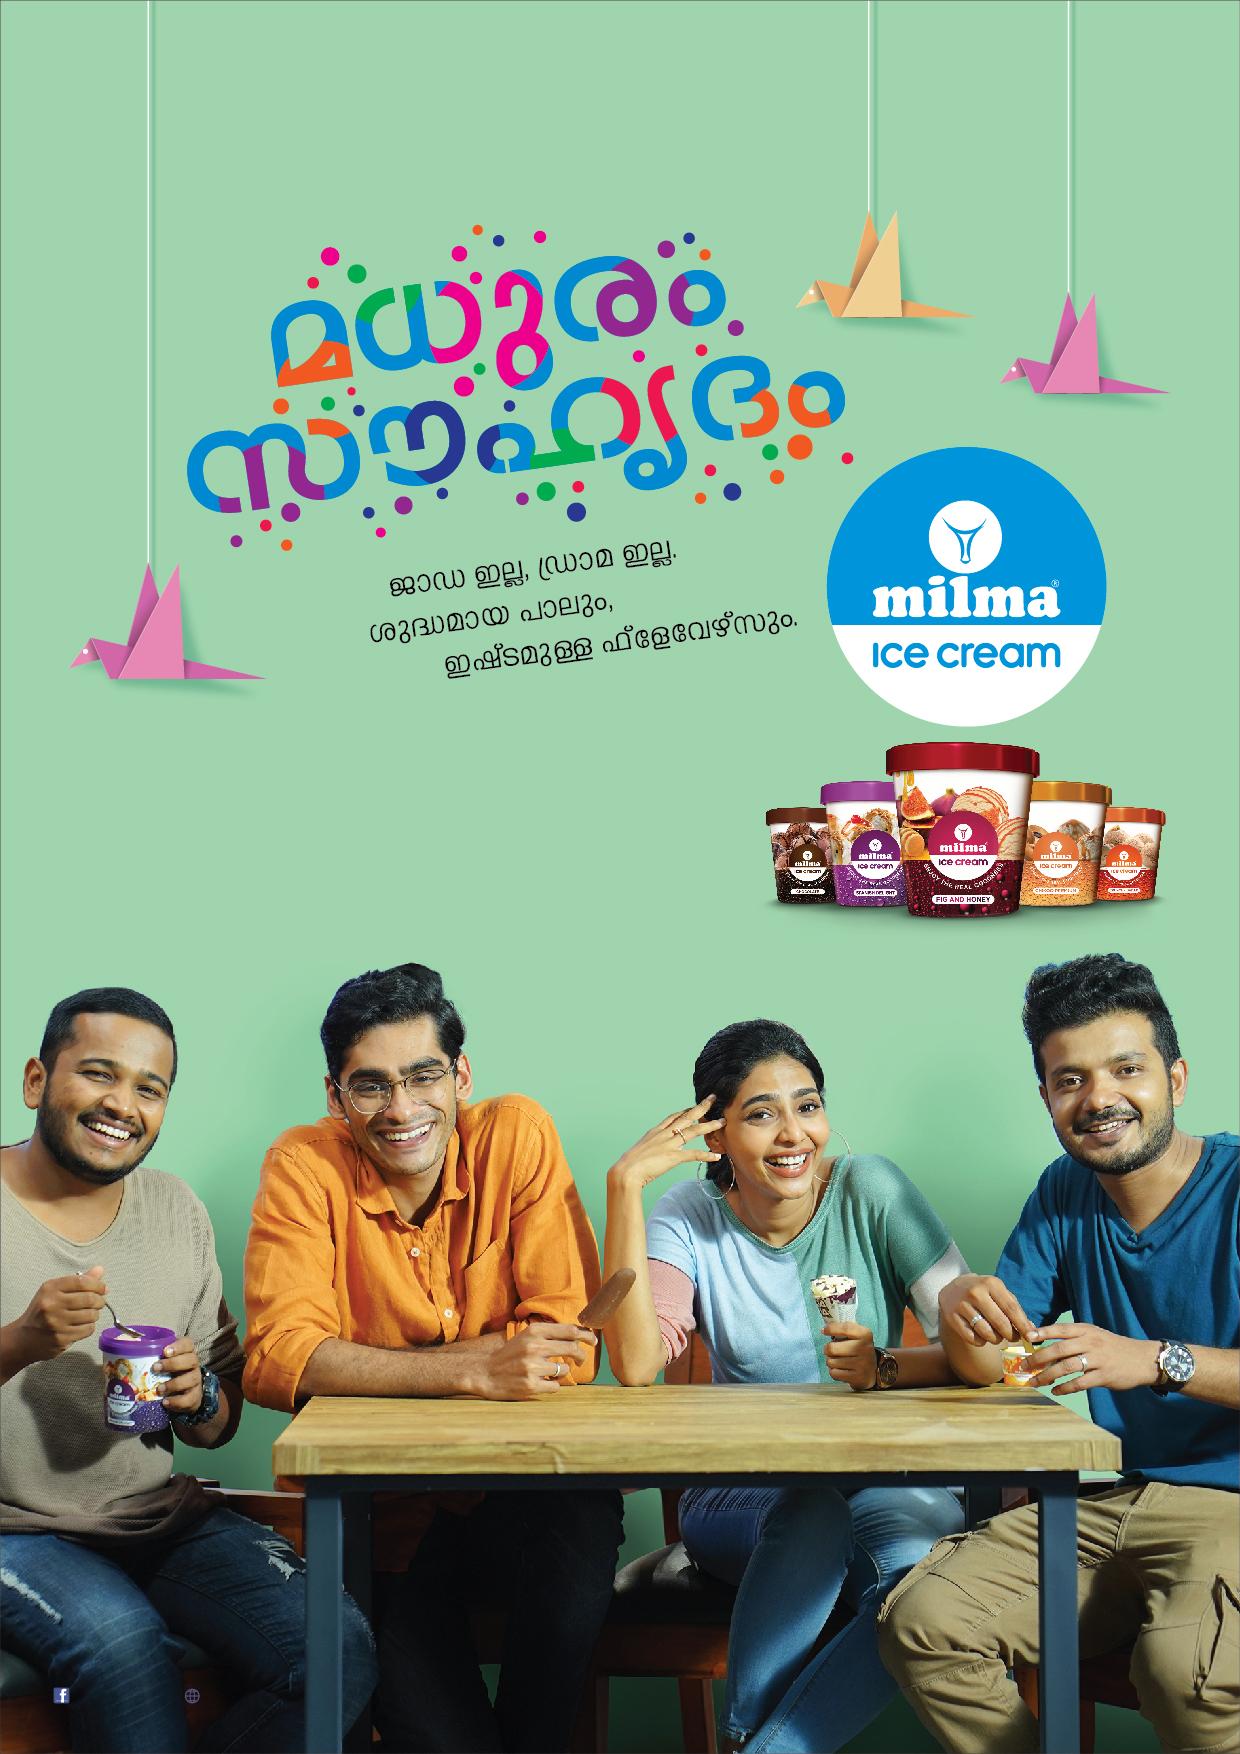 Milma Icecream Advertisement by Malayalam Actress Aishwarya Lekshmi | Print mock-up 6 by Stark Communications Pvt Ltd